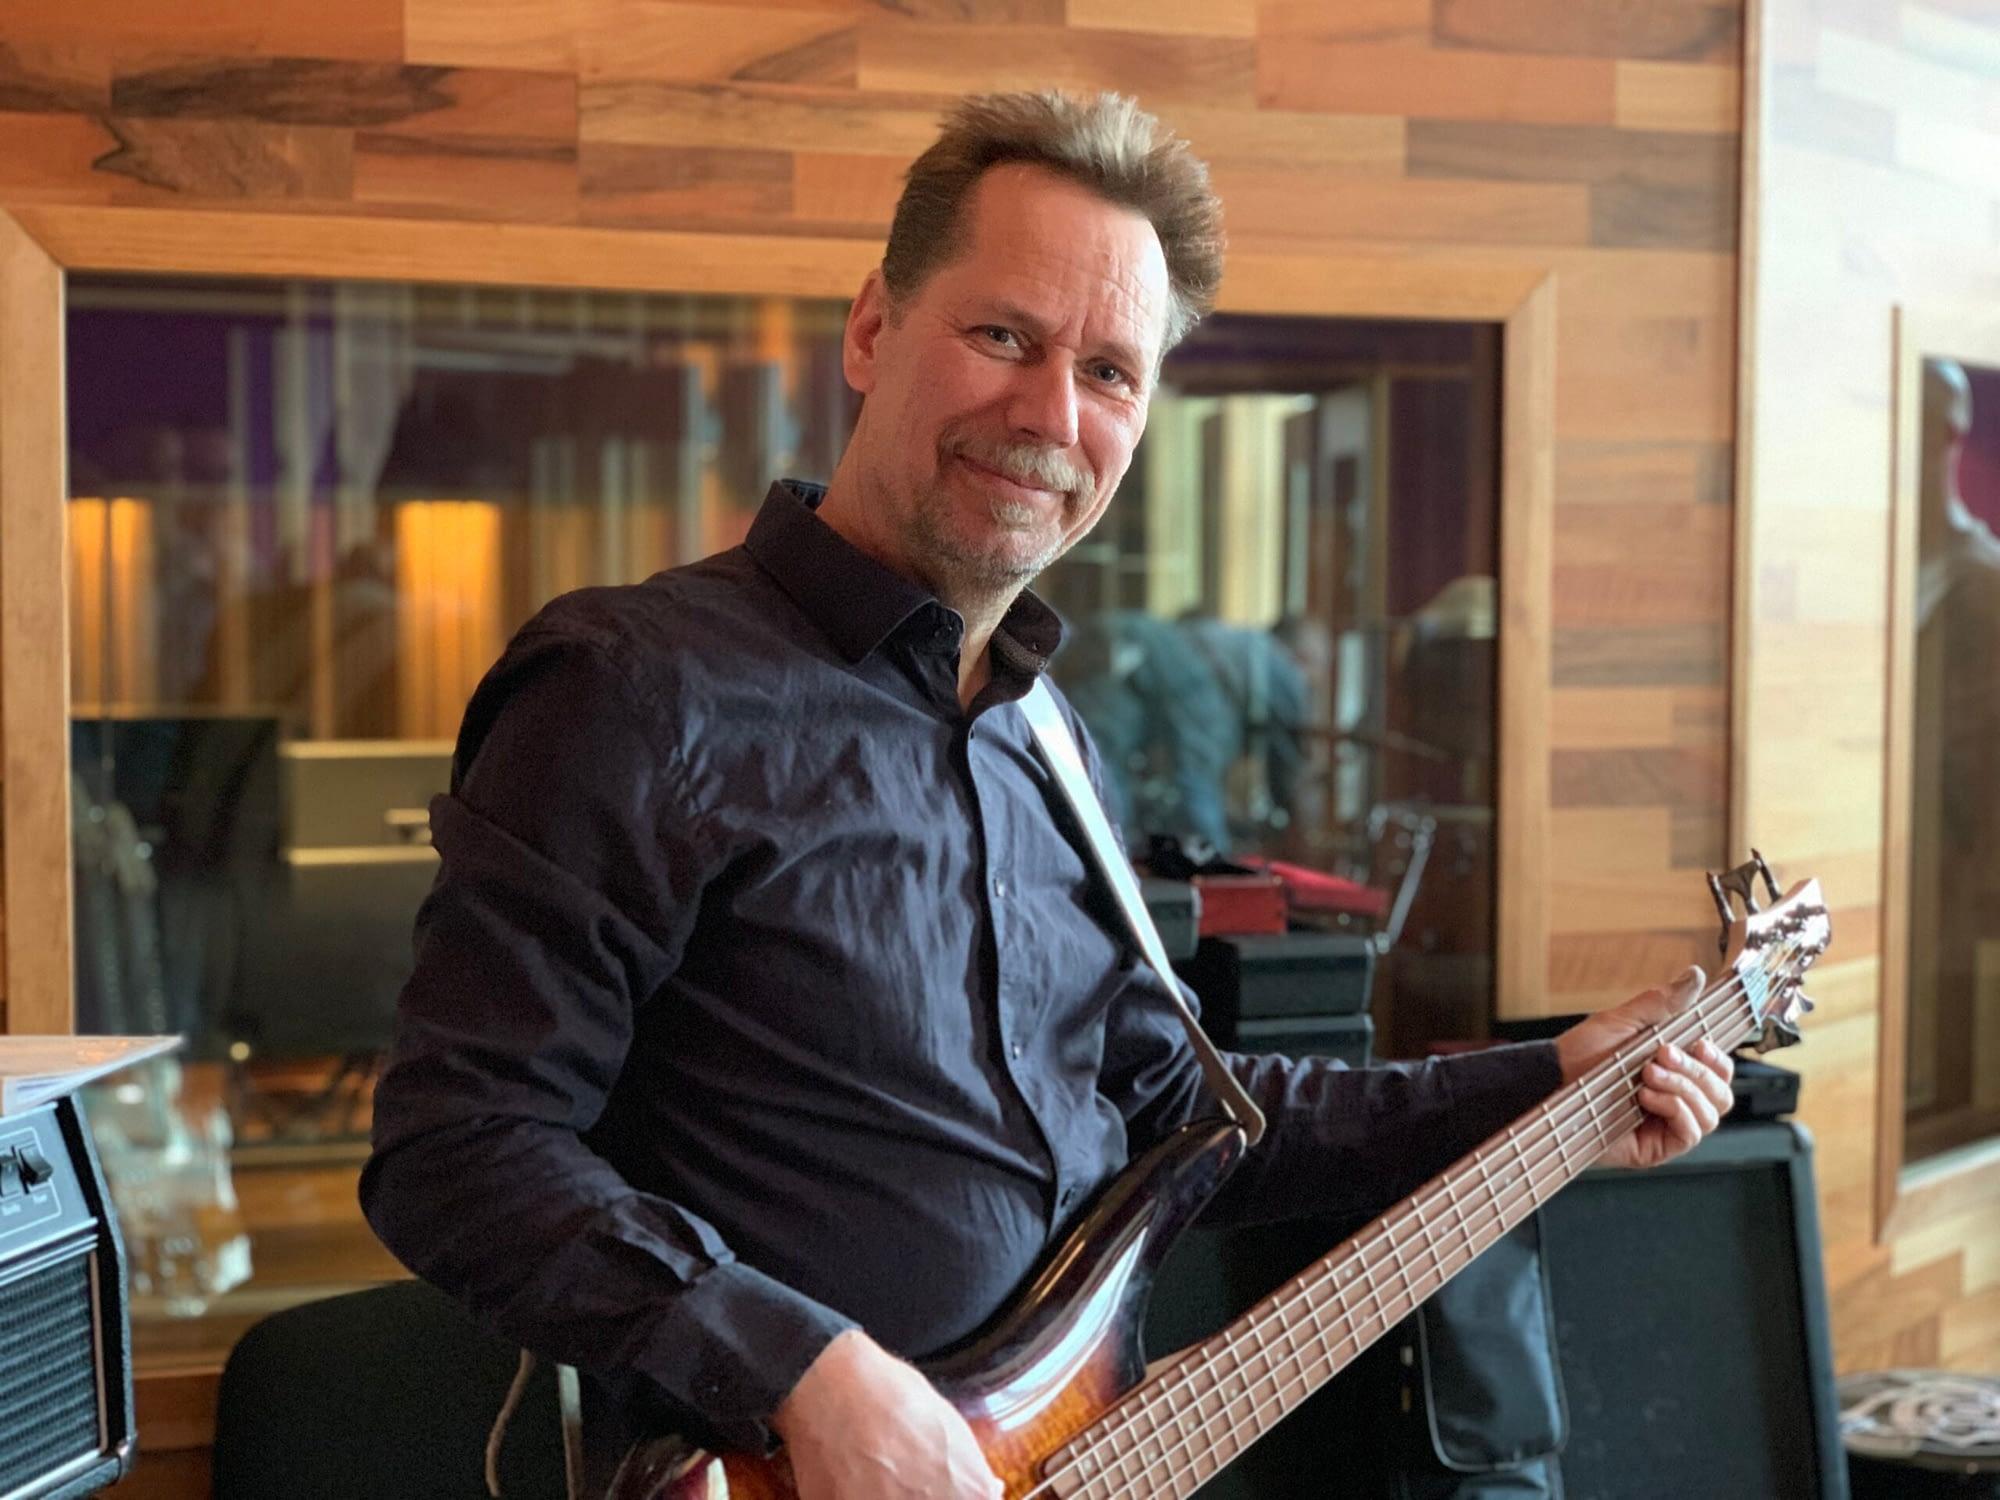 Bass player Thomas Midemyr recording electric bass